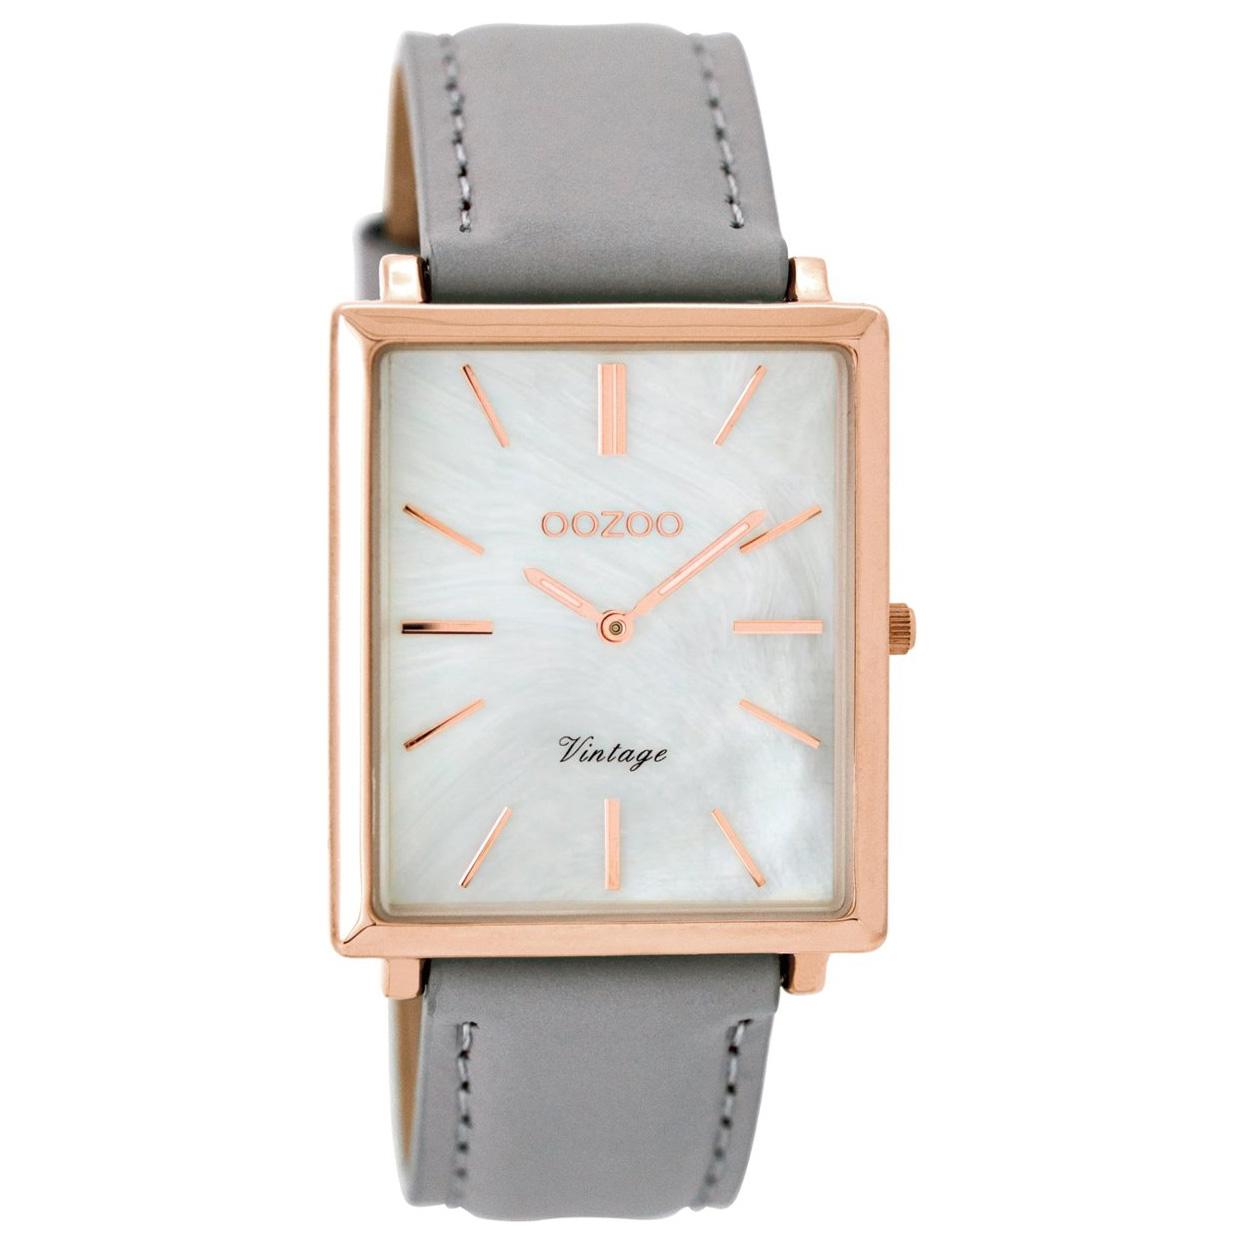 OOZOO C8185 Horloge Vintage rosekleurig-lichtgrijs 31 x 37 mm